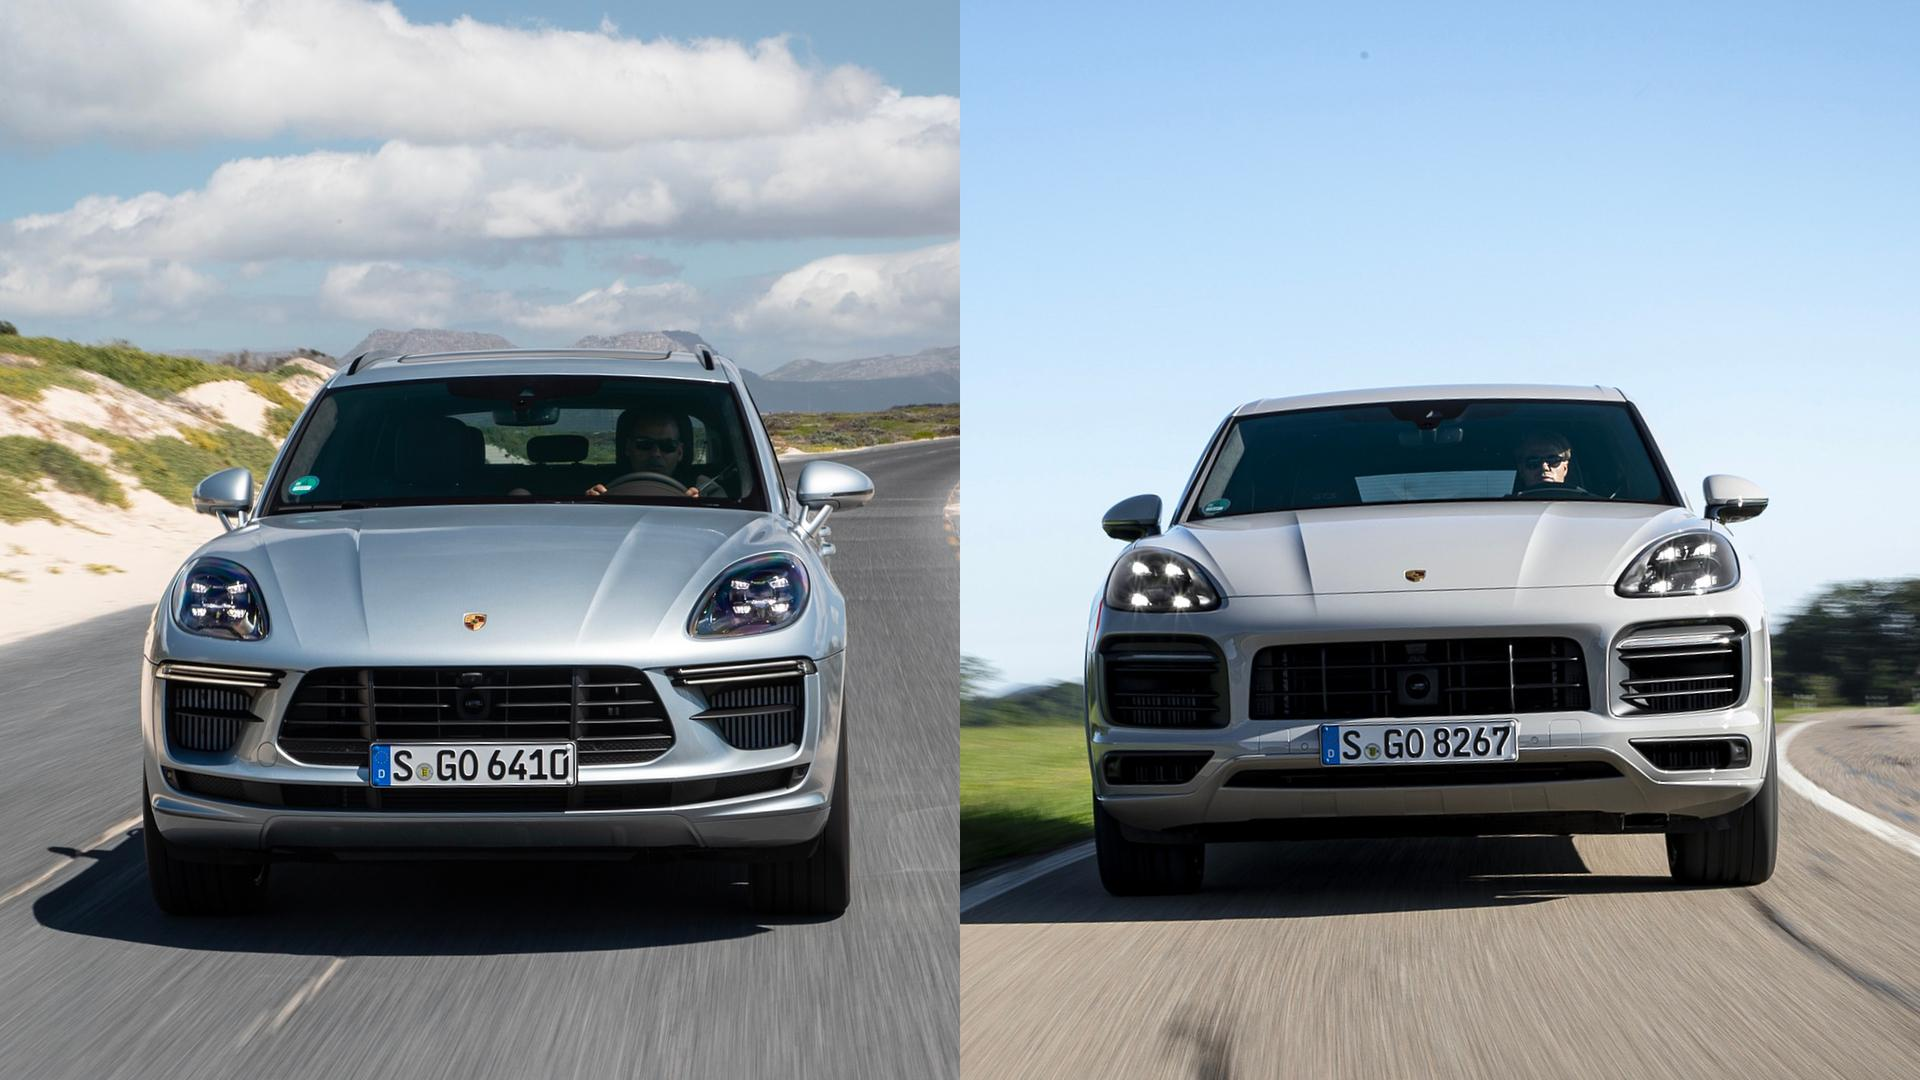 Porsche Macan vs Cayenne